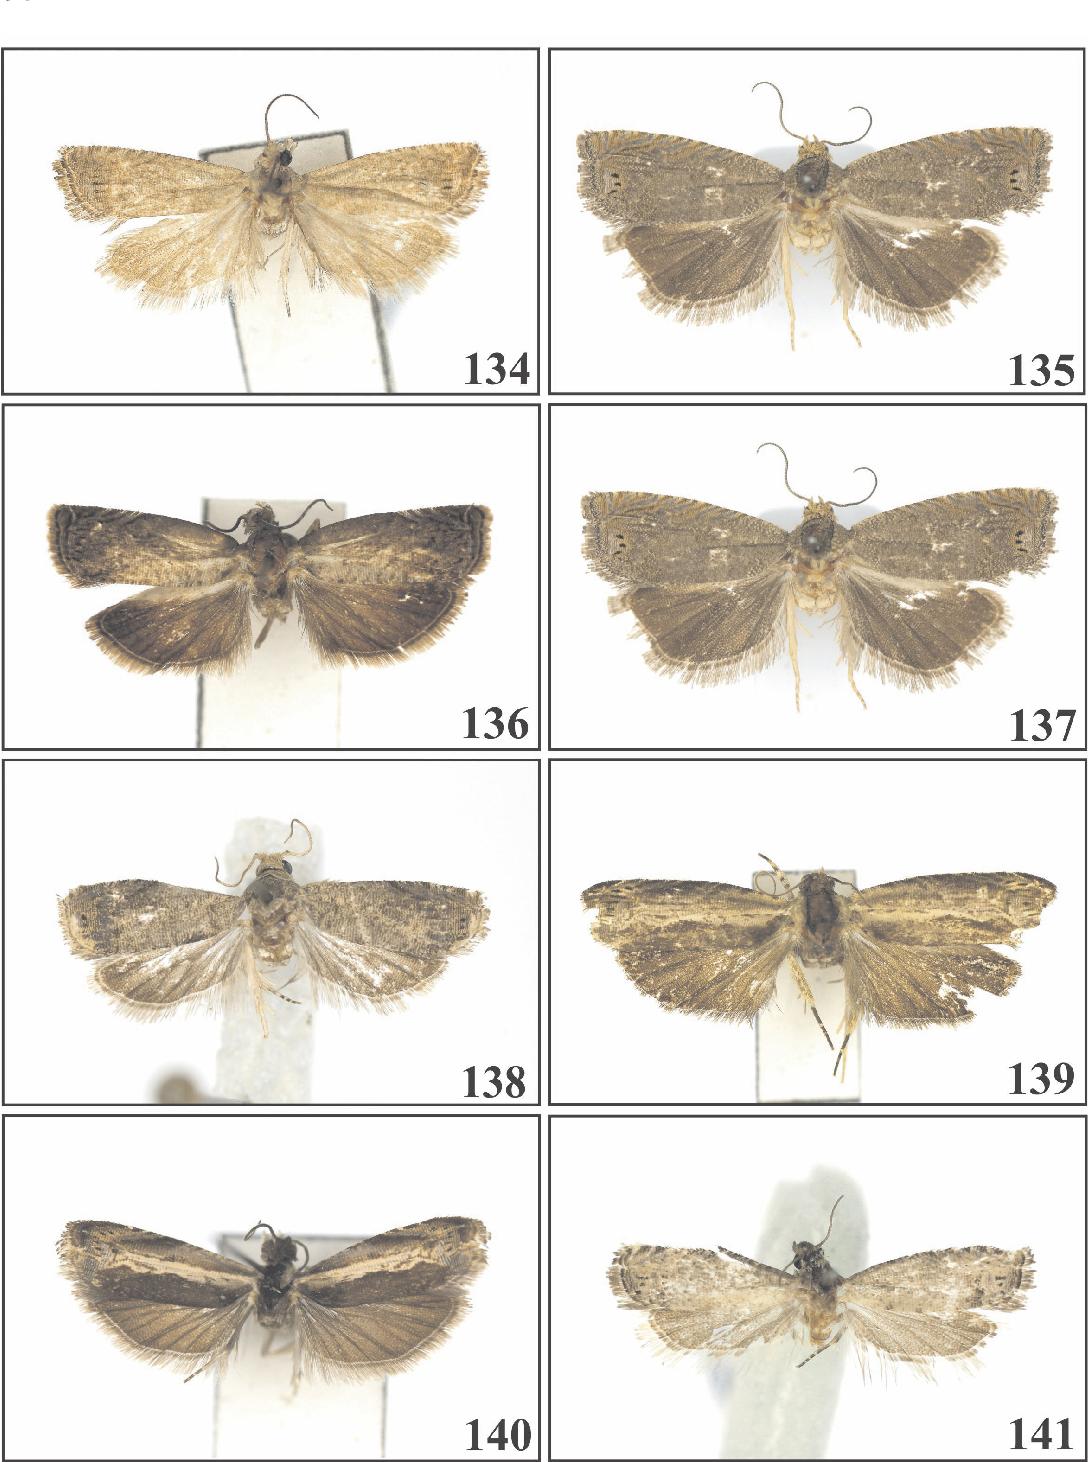 figure 134-141